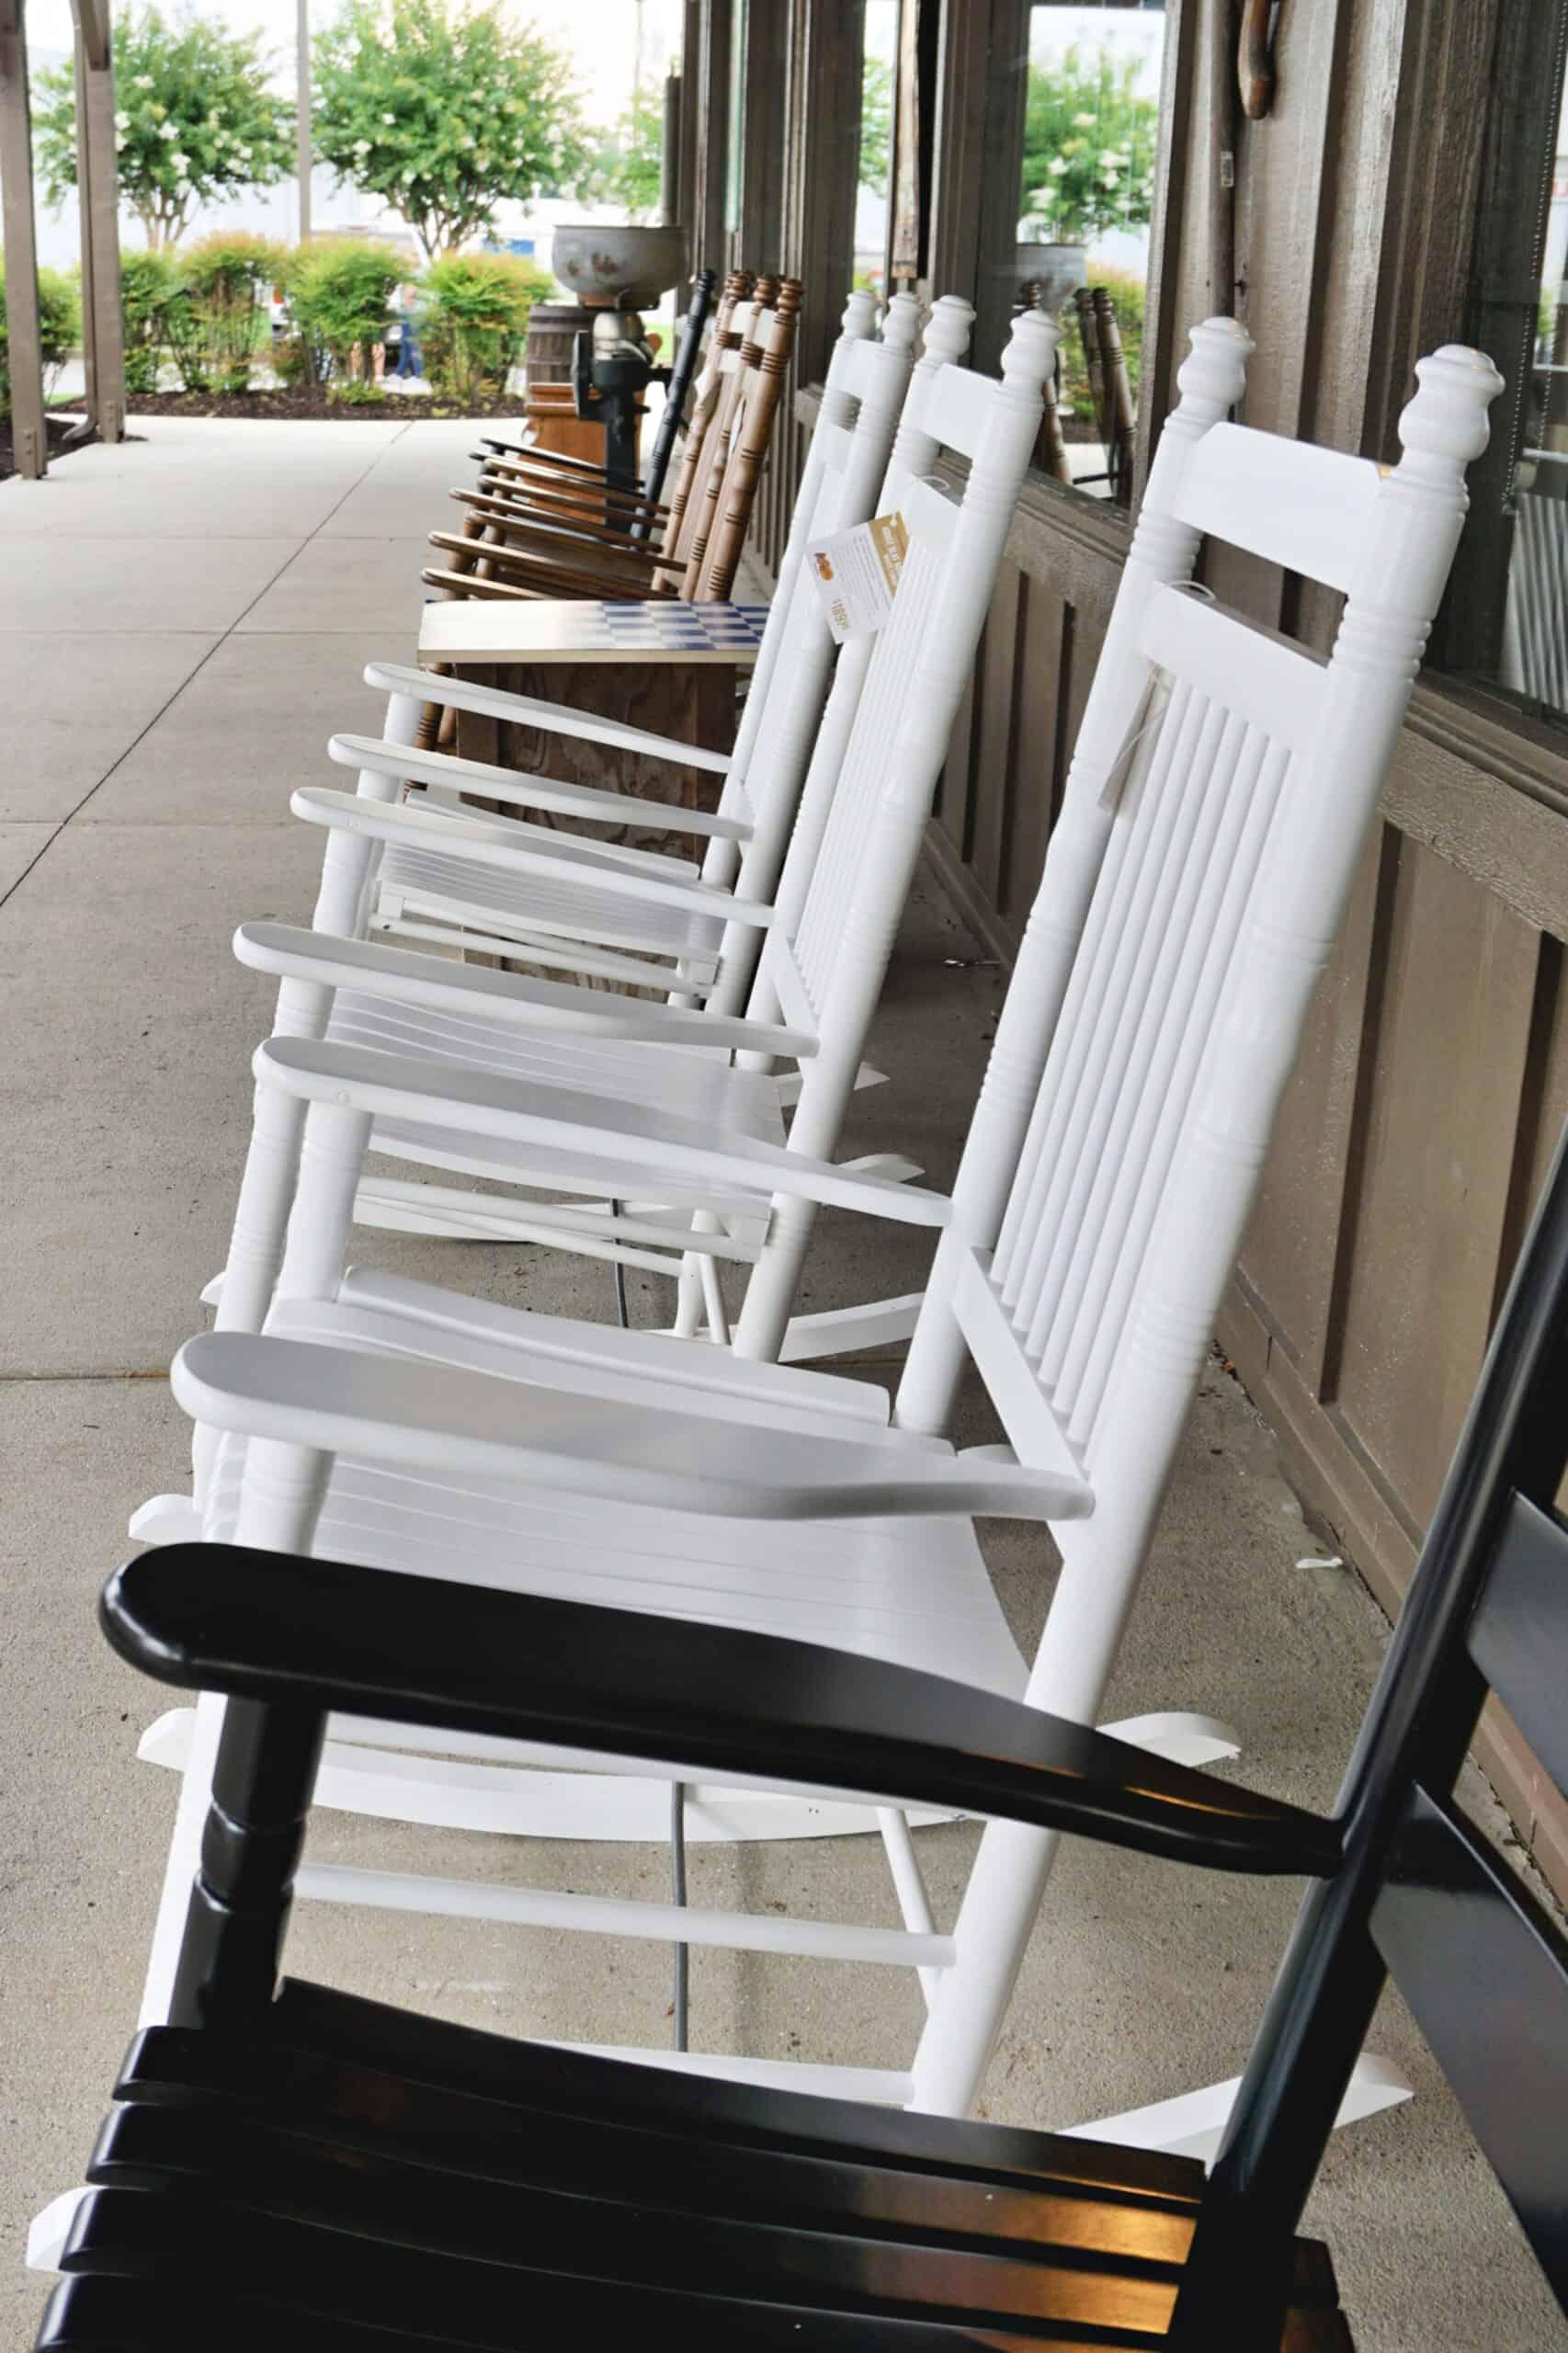 rocking chairs outside Cracker Barrel